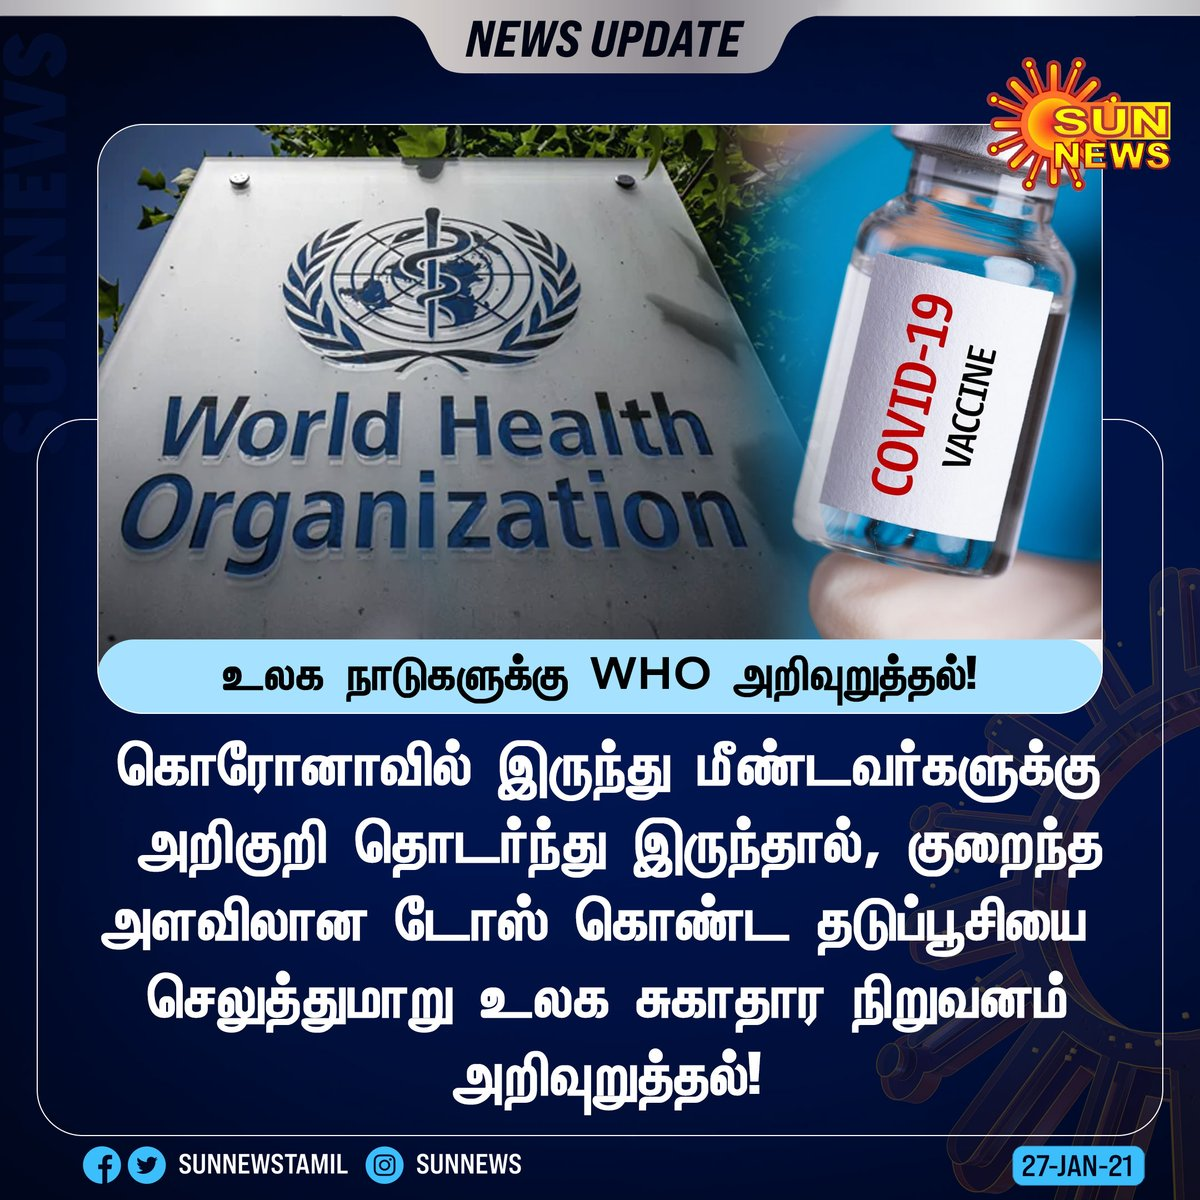 #NewsUpdate | உலக நாடுகளுக்கு WHO அறிவுறுத்தல்!  #Sunnews | #WHO | #CoronaVaccine | #Covid19